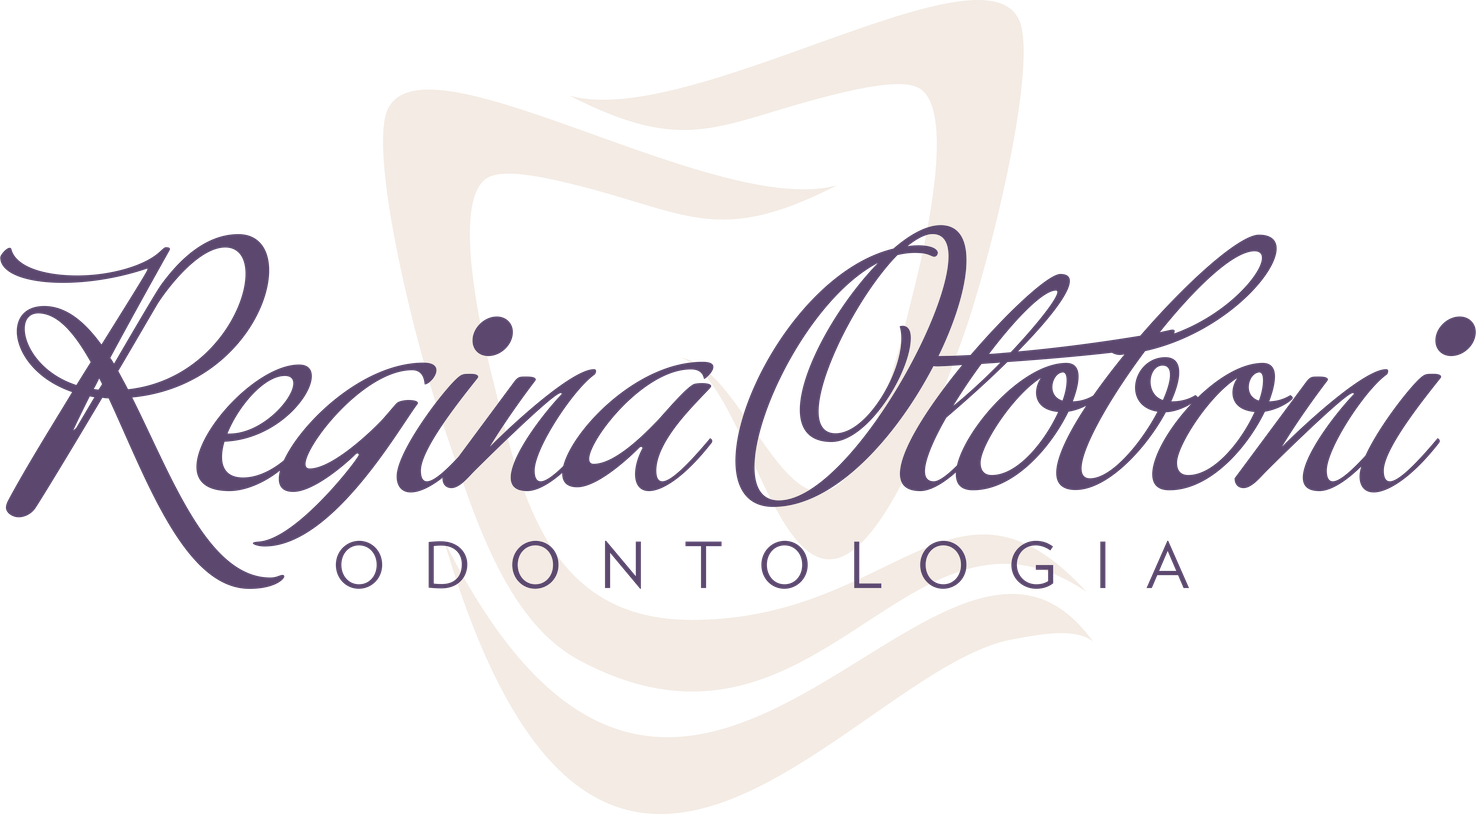 Regina Otoboni Logo